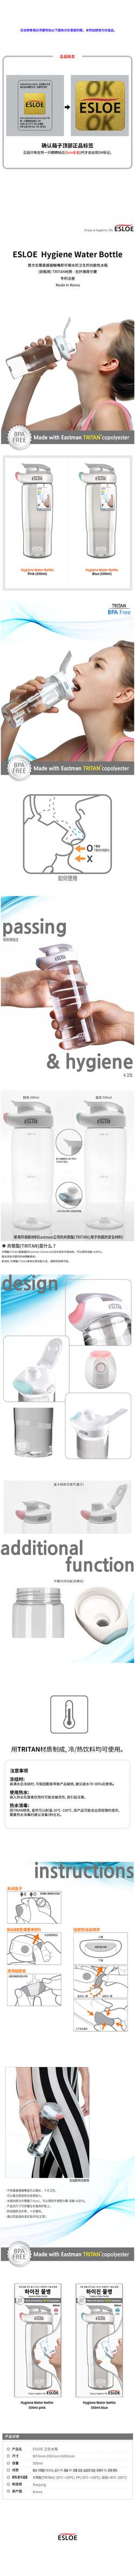 hygiene_500ml_detail_Chinese_(jpg)